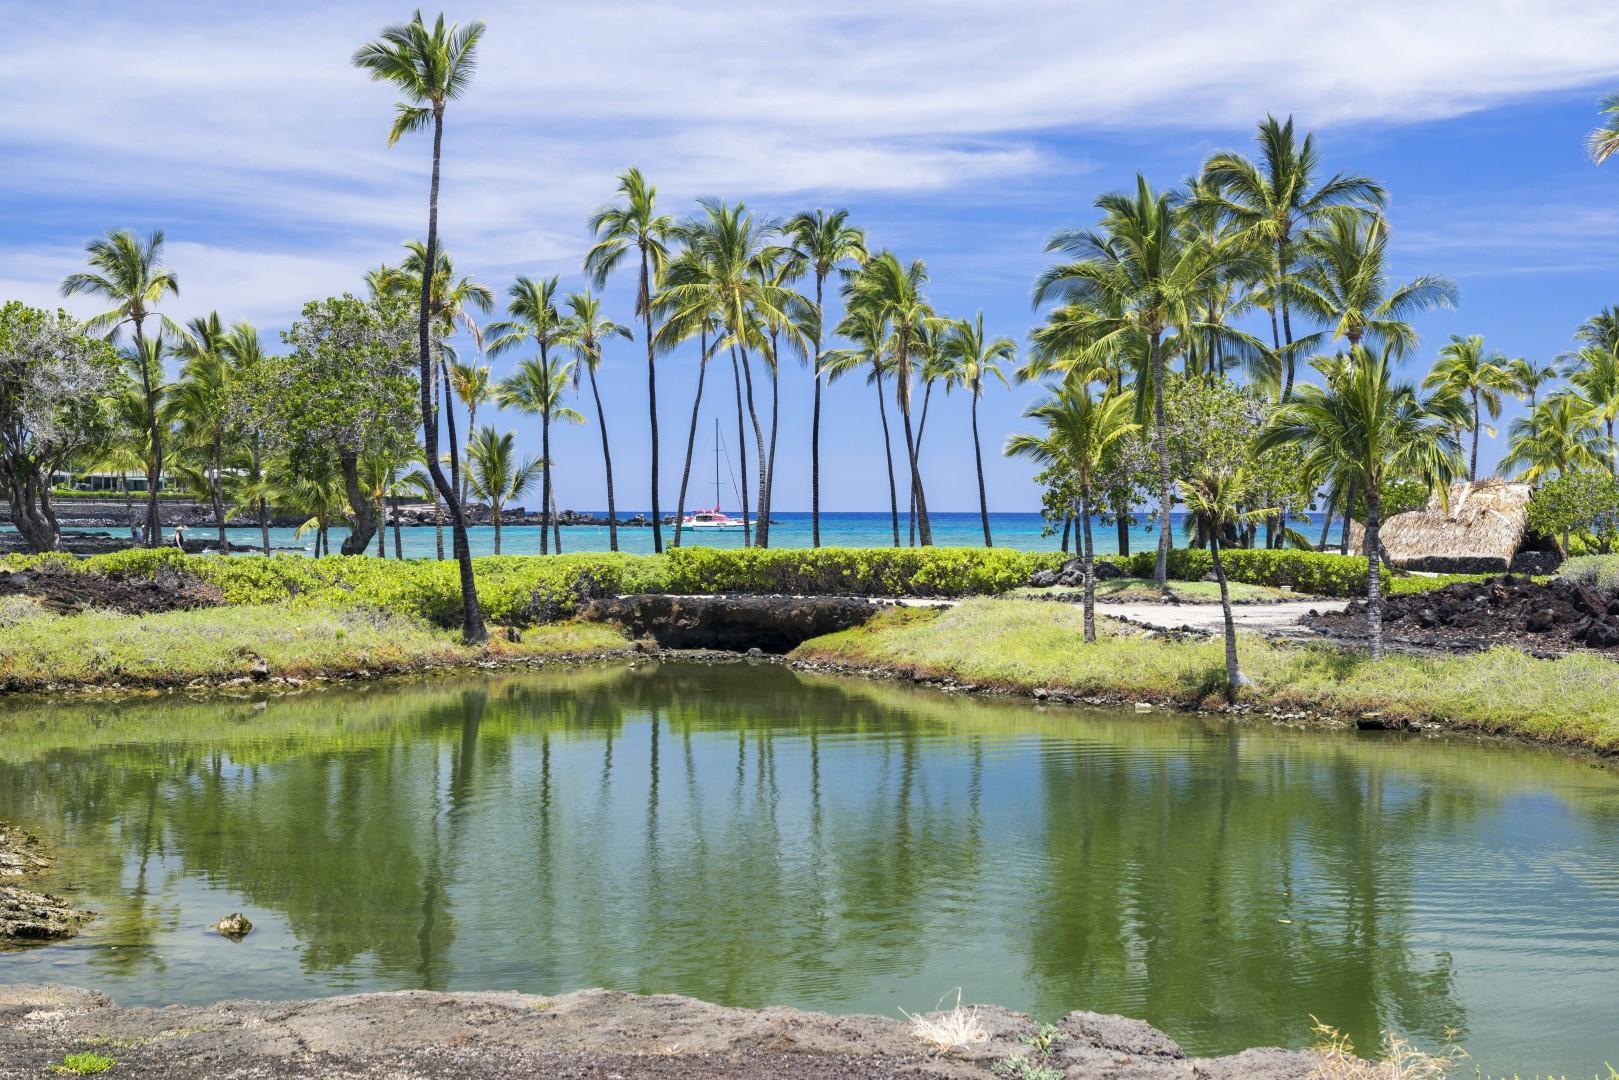 Enjoy walking around the fishponds at Mauna Lani Auberge Resort